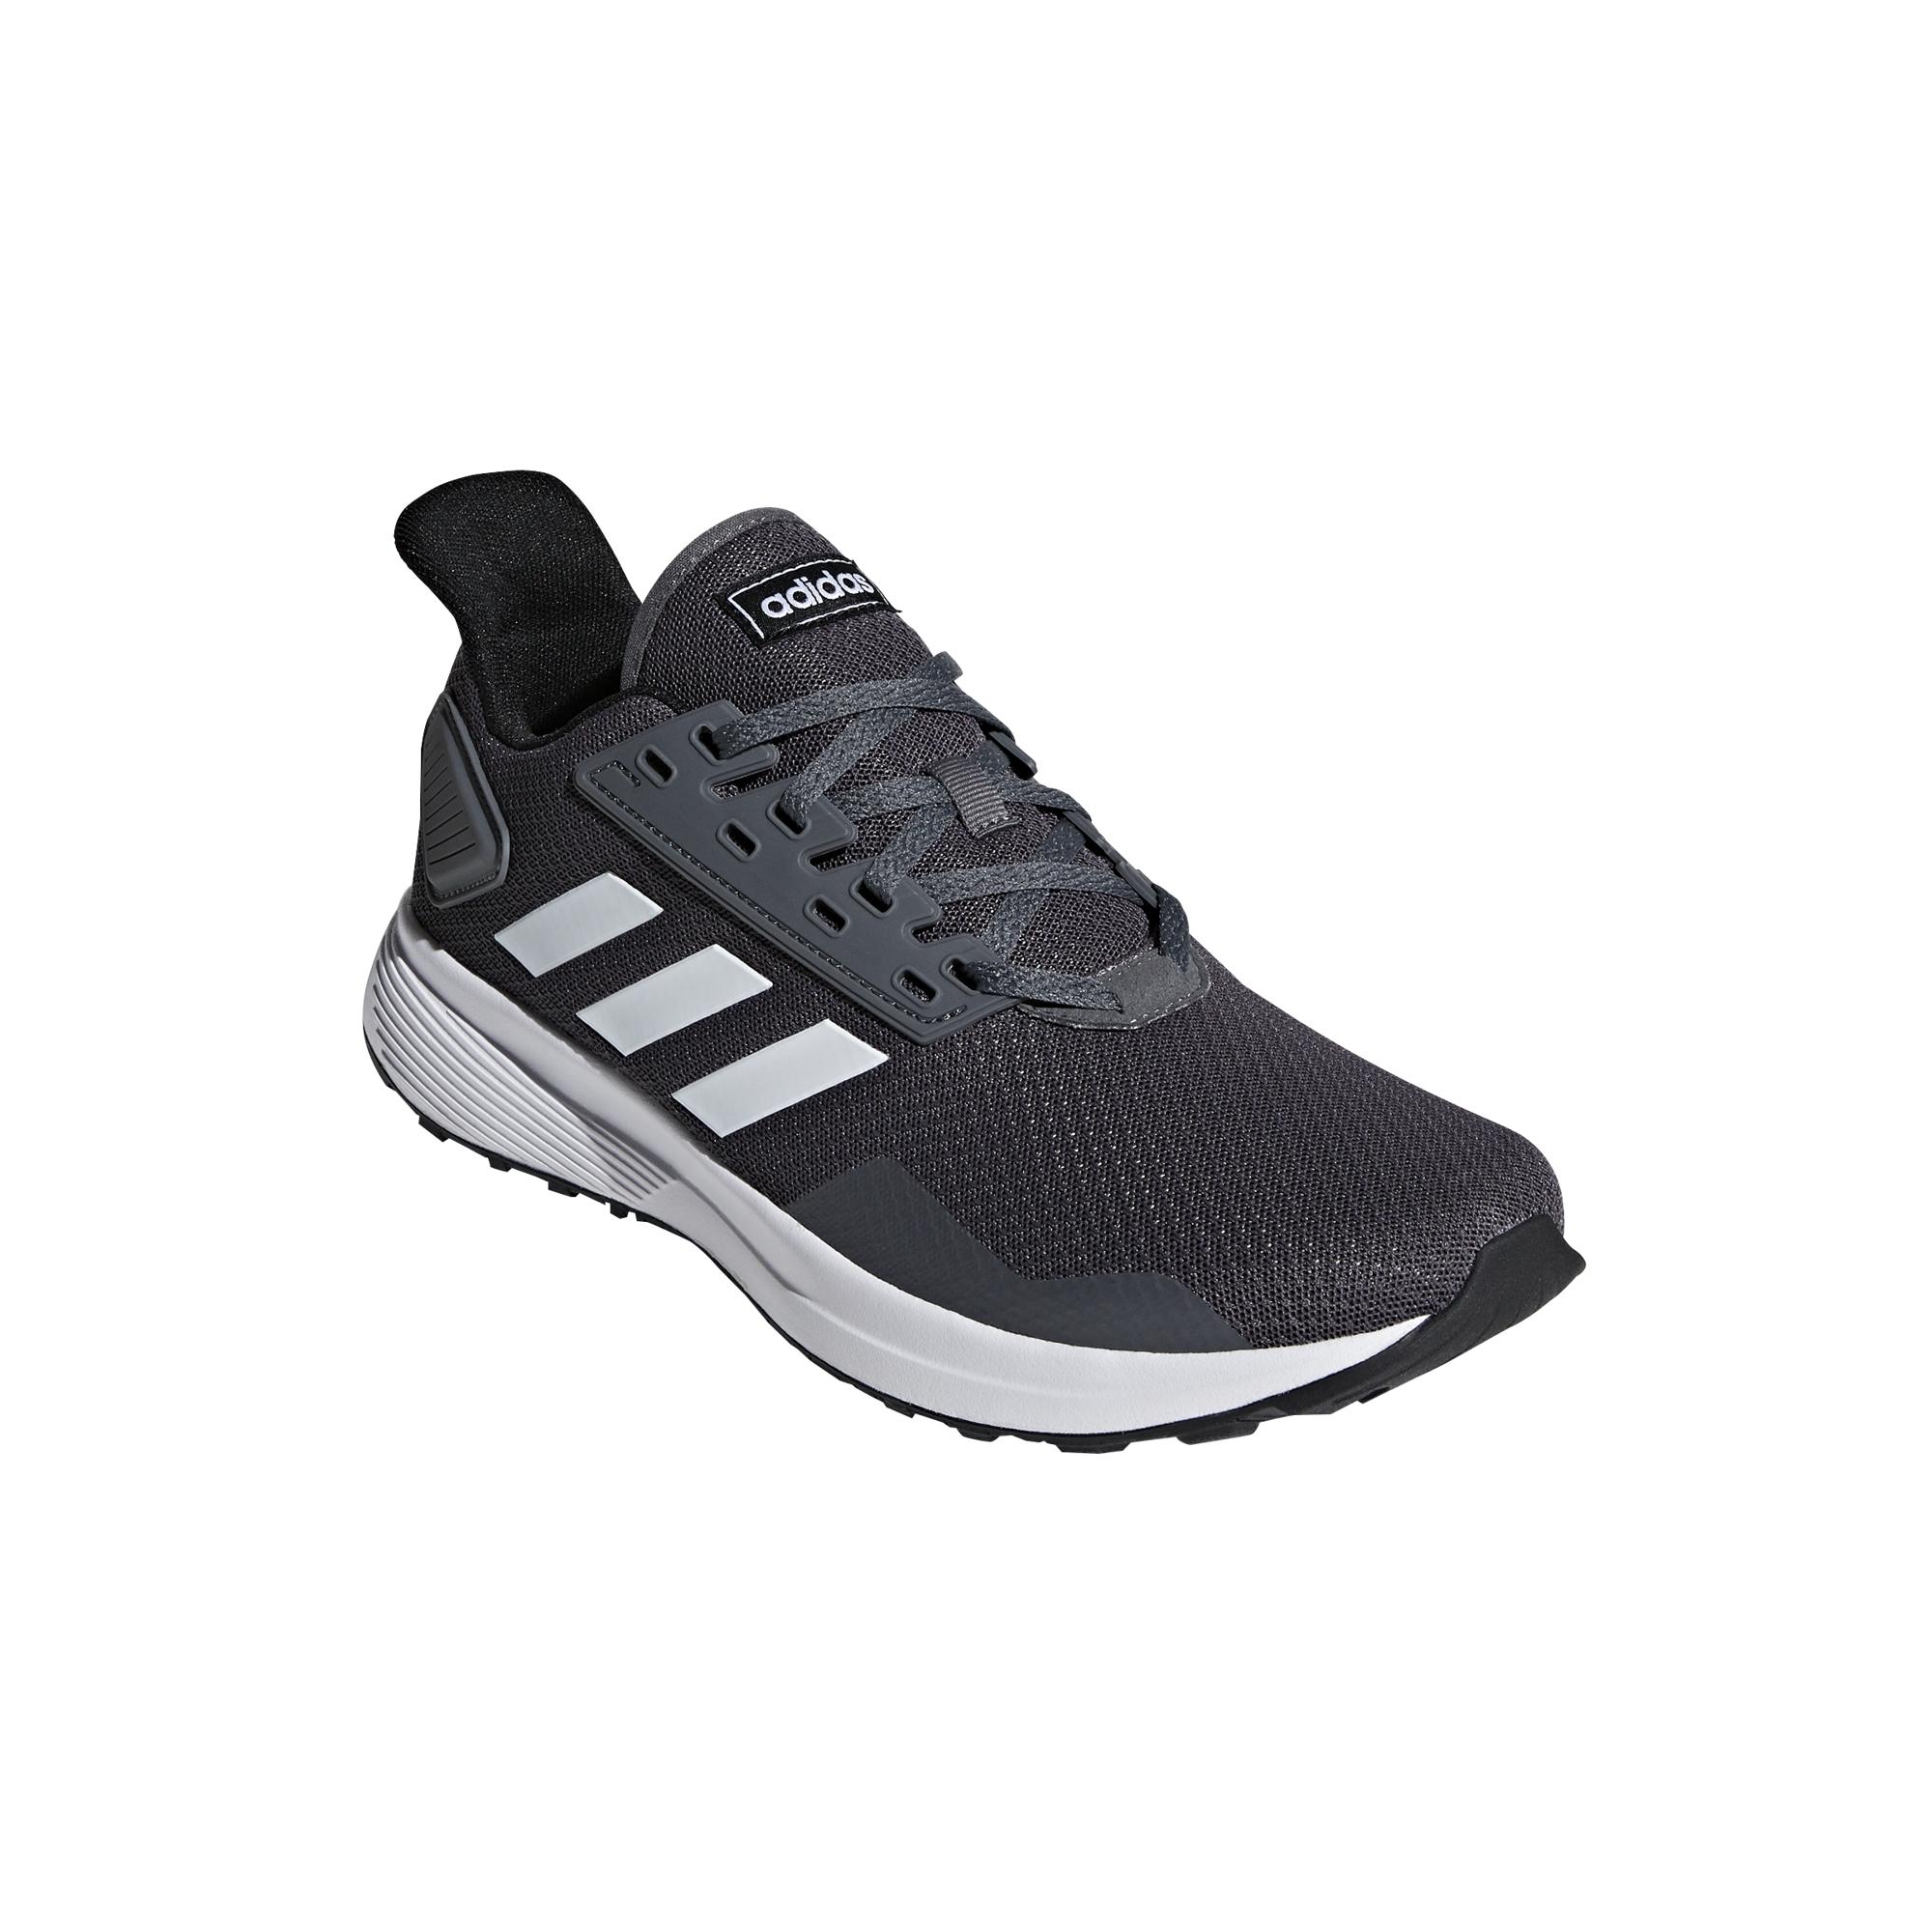 huge discount 6f953 d361e Chaussures adidas Duramo 9